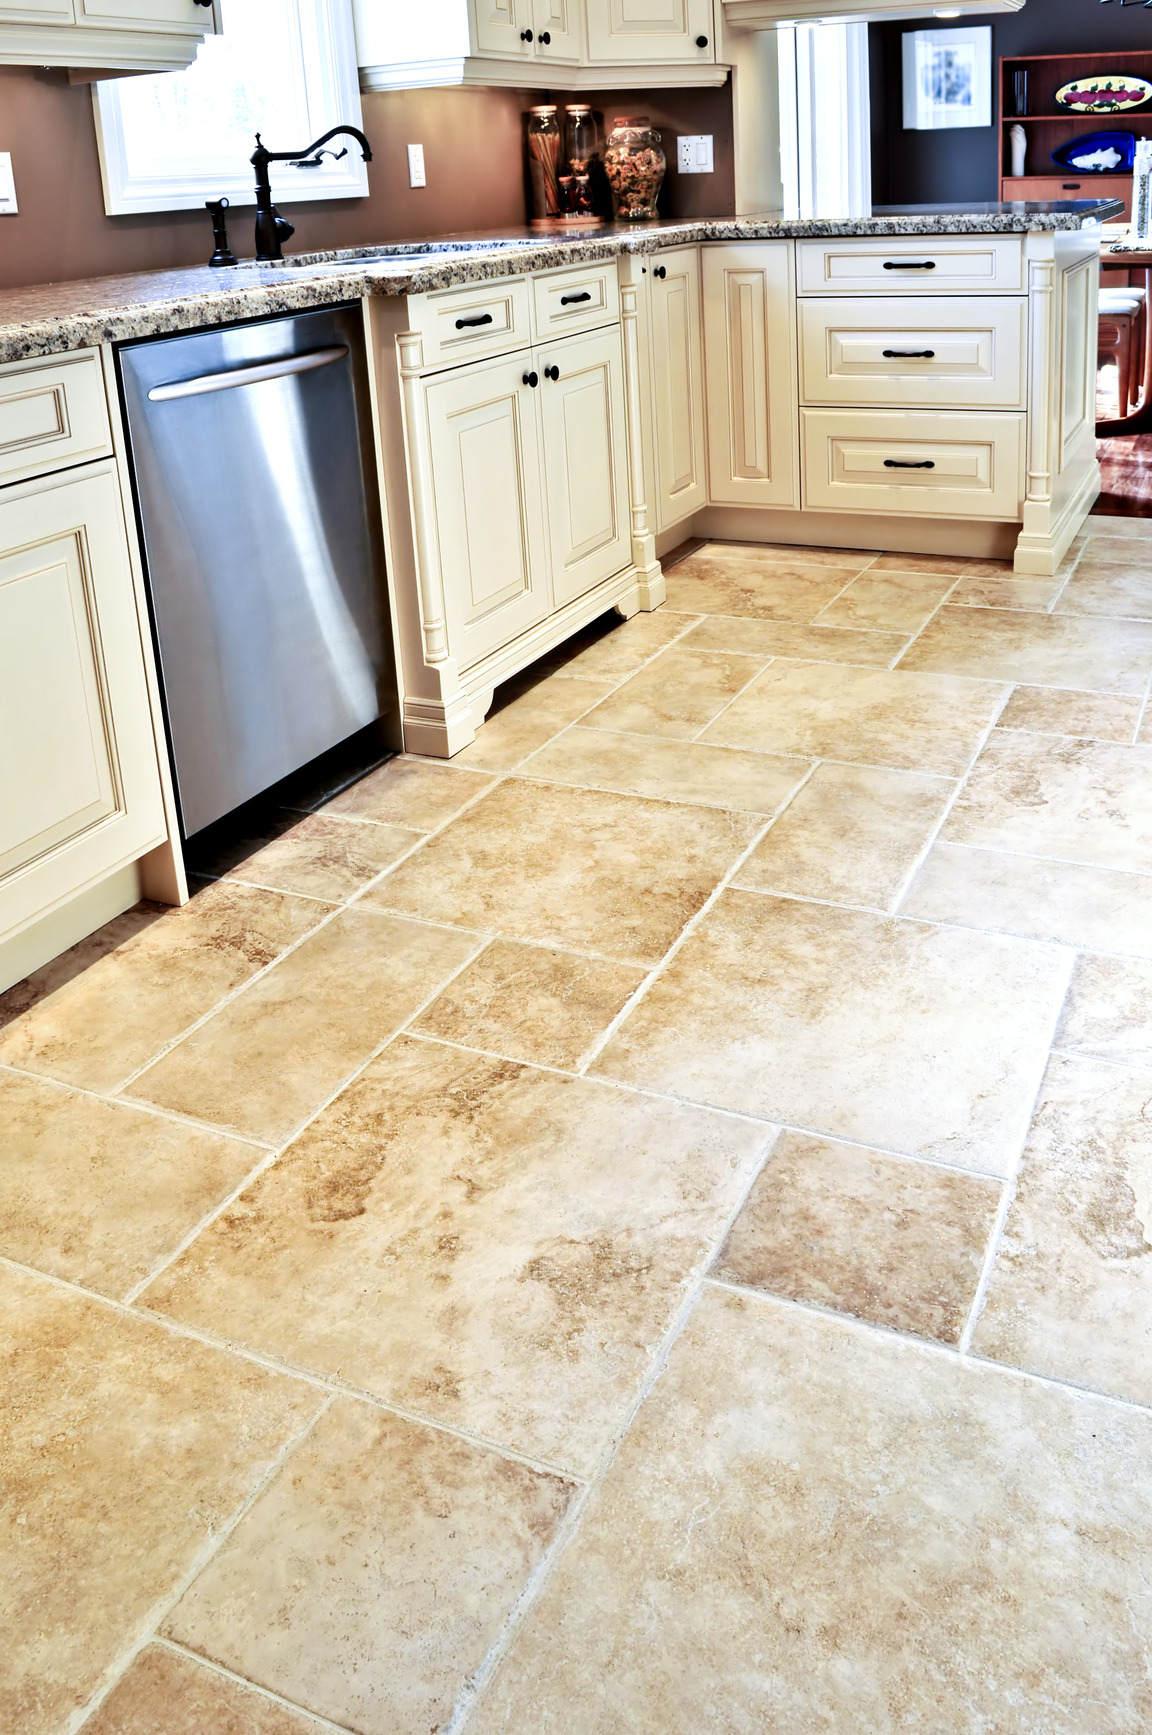 kitchen cabinet tile ideas photo - 3